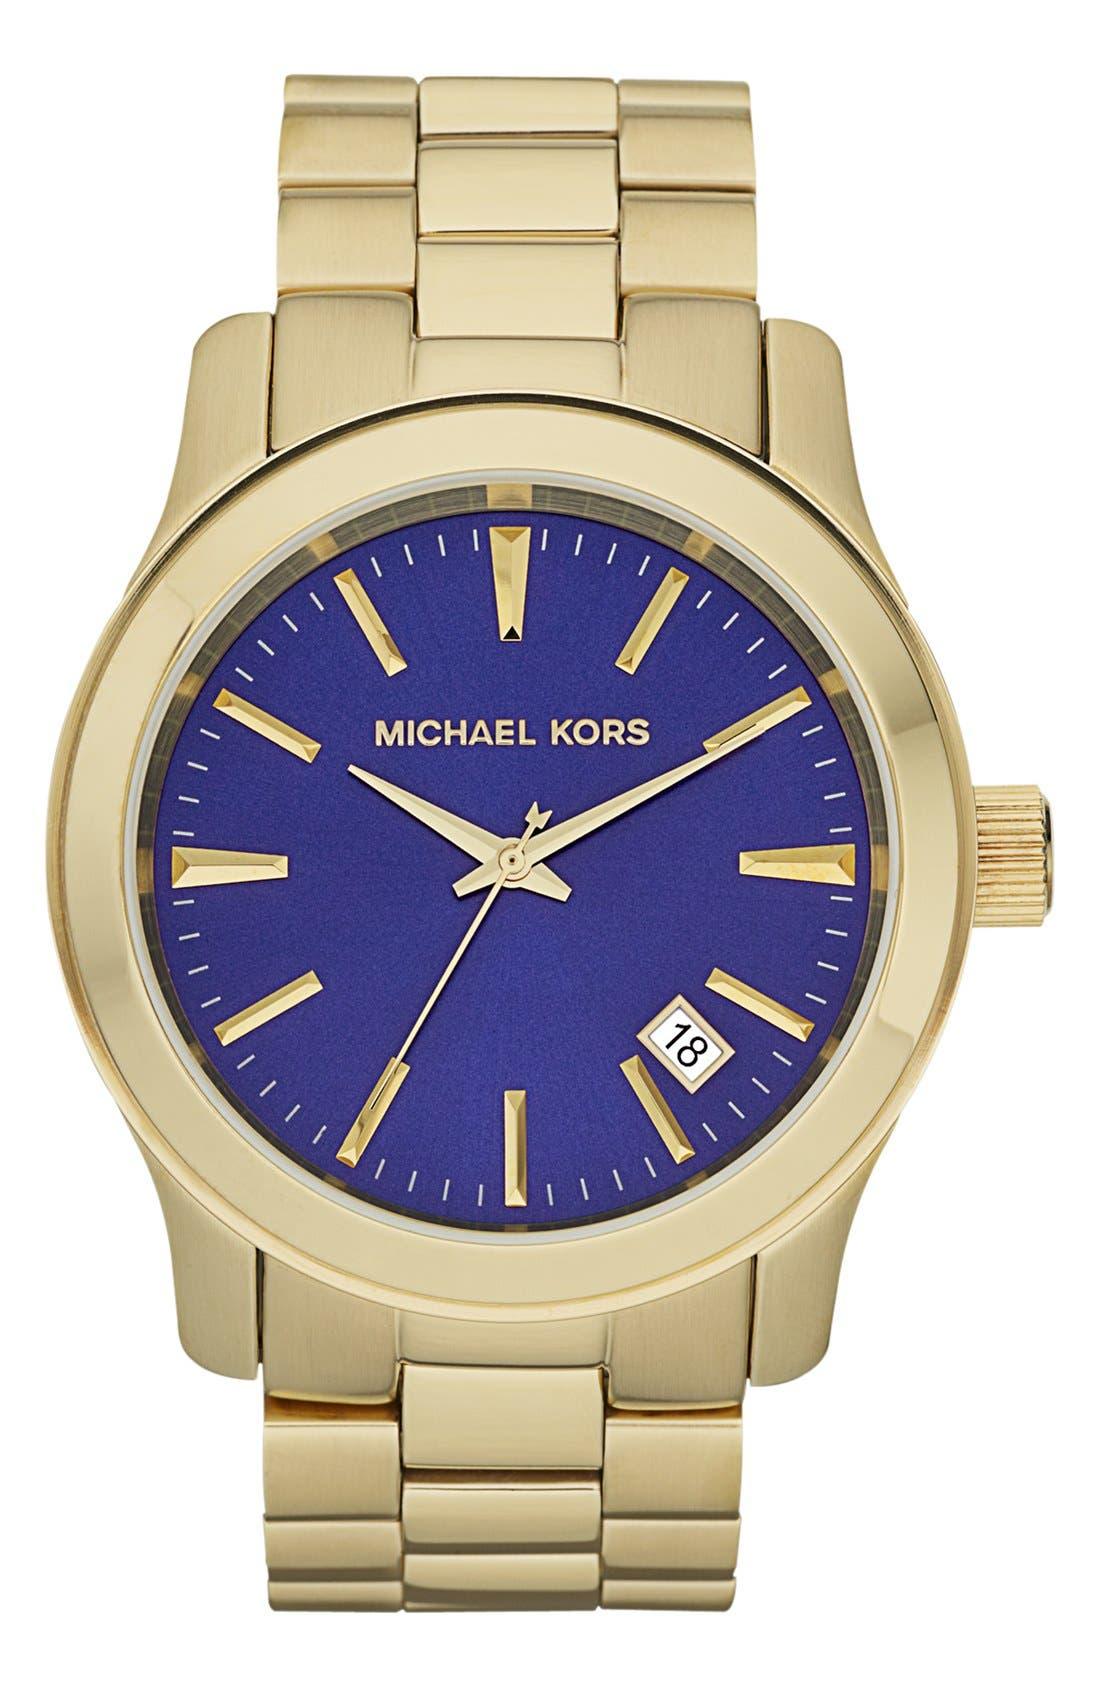 Main Image - Michael Kors 'Large Runway' Bracelet Watch, 44mm